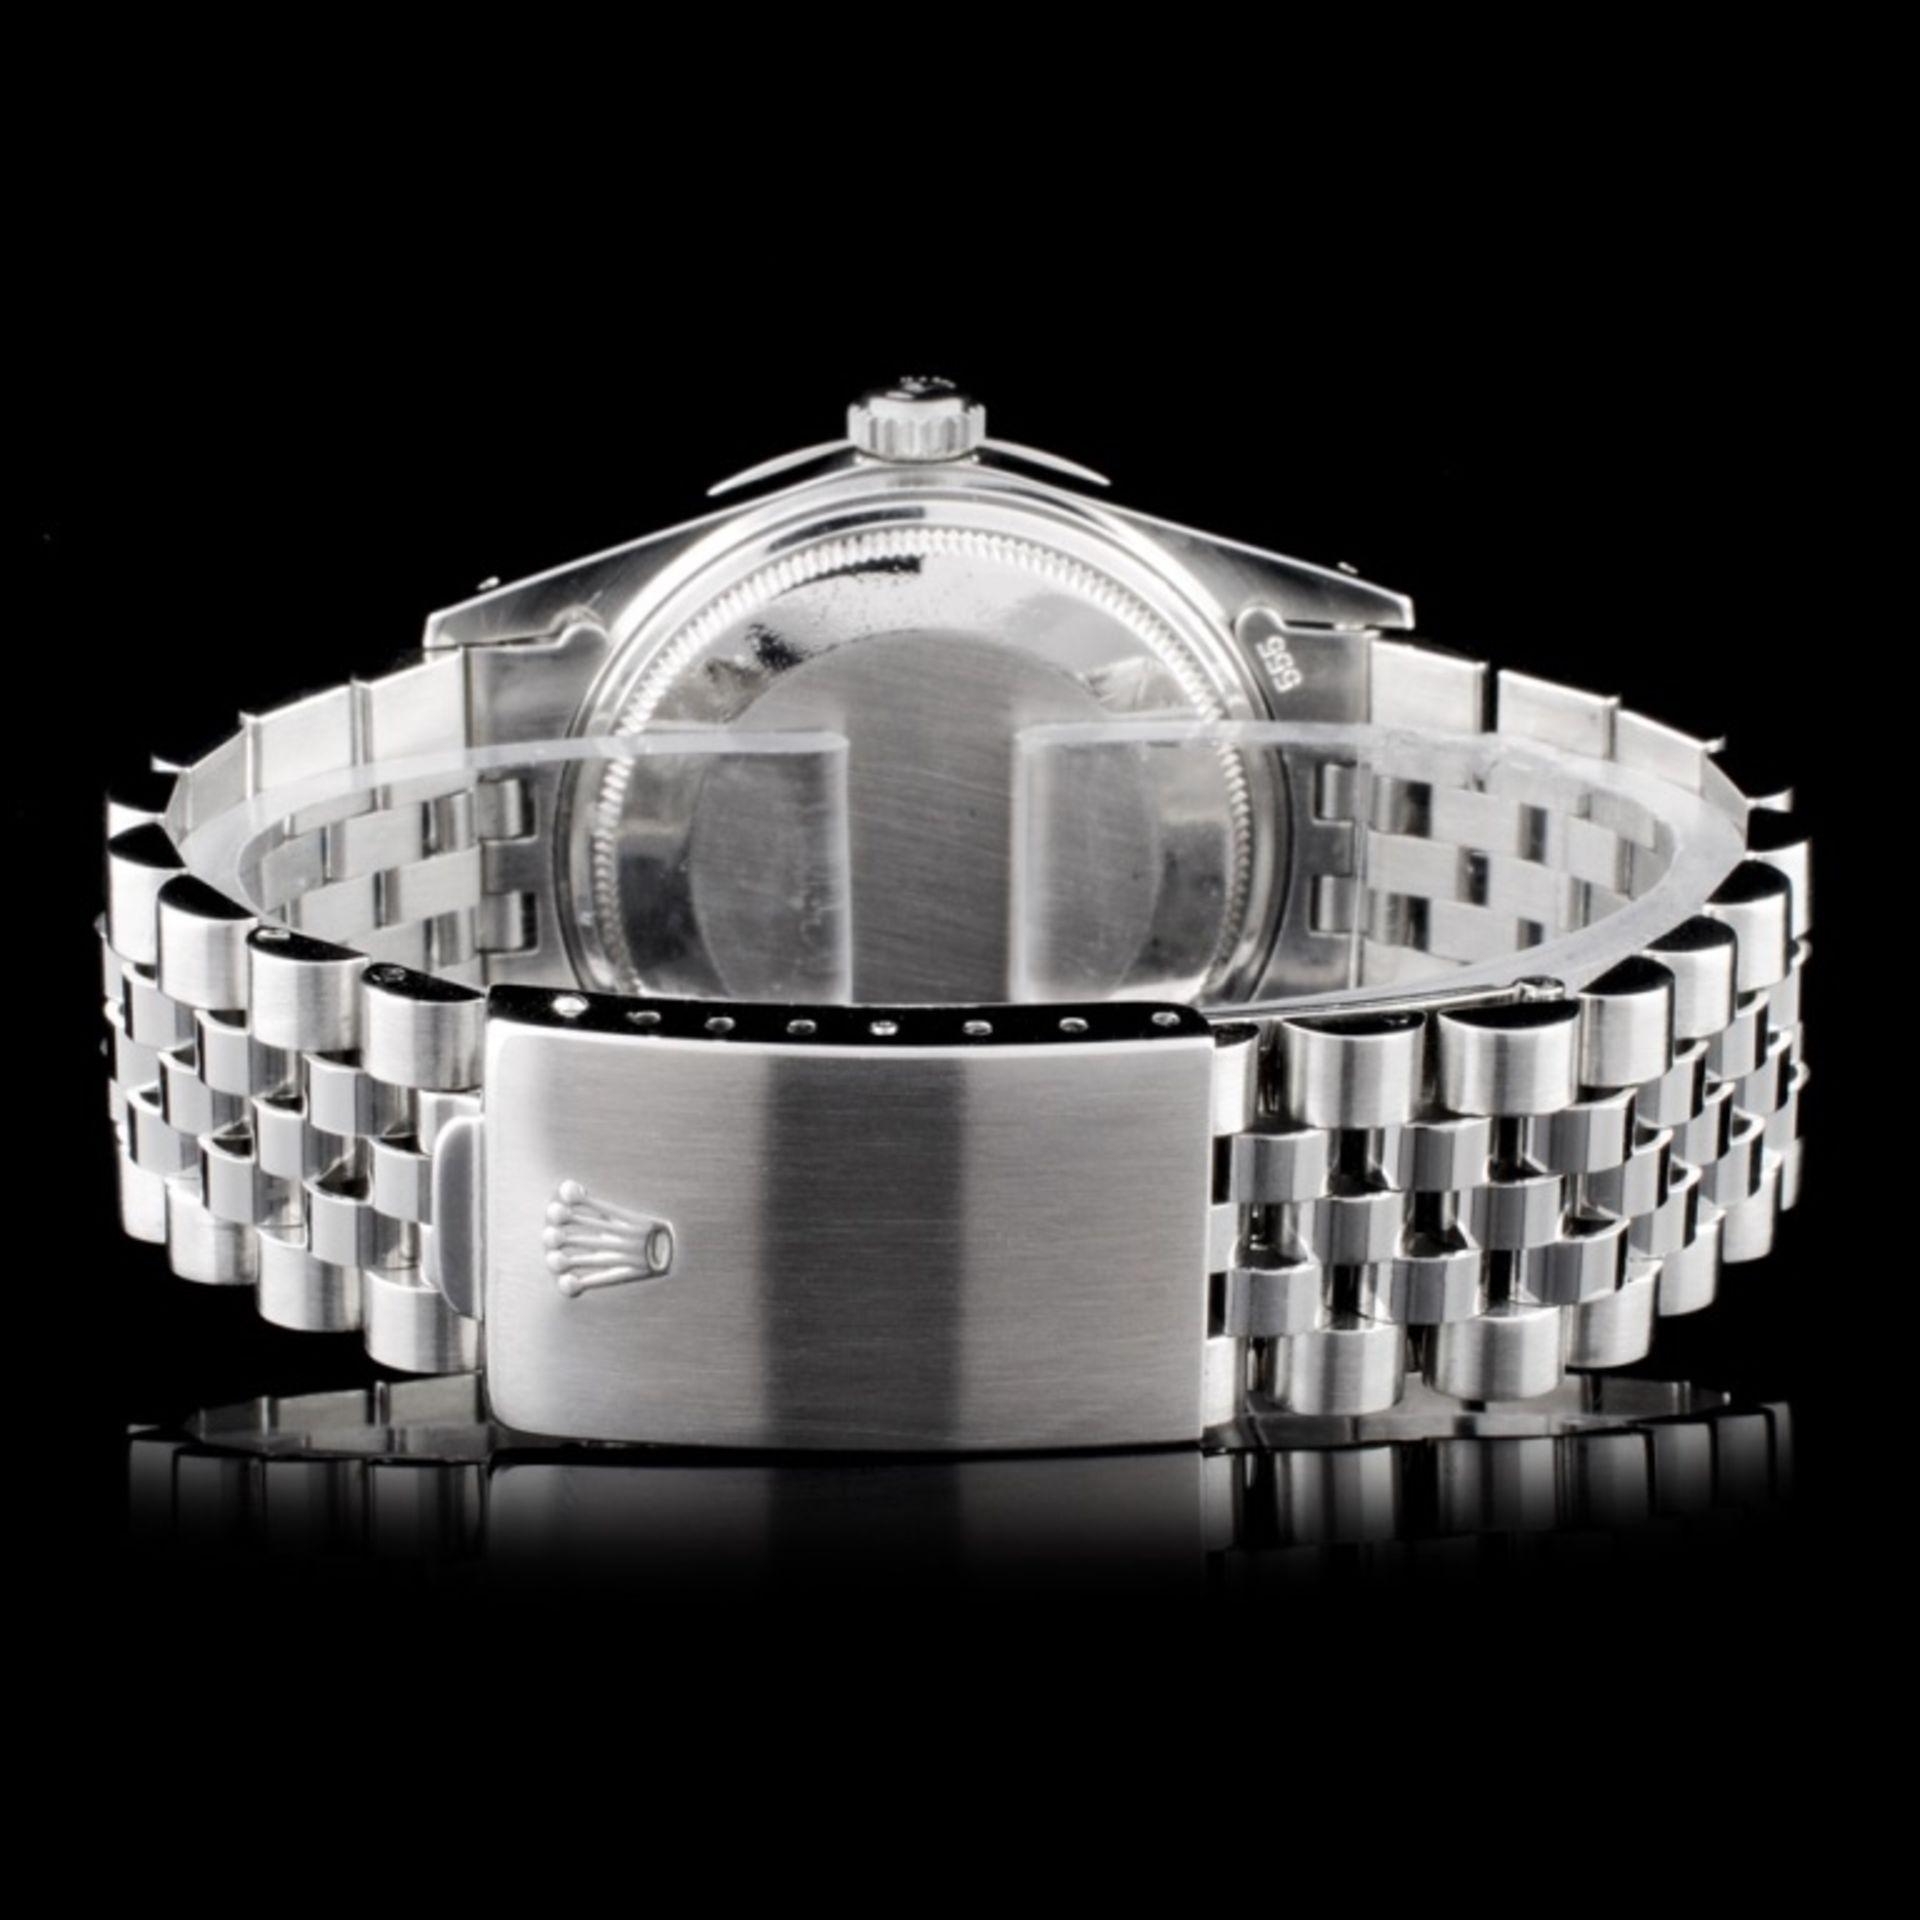 Rolex SS DateJust Diamond 36MM Wristwatch - Image 3 of 5